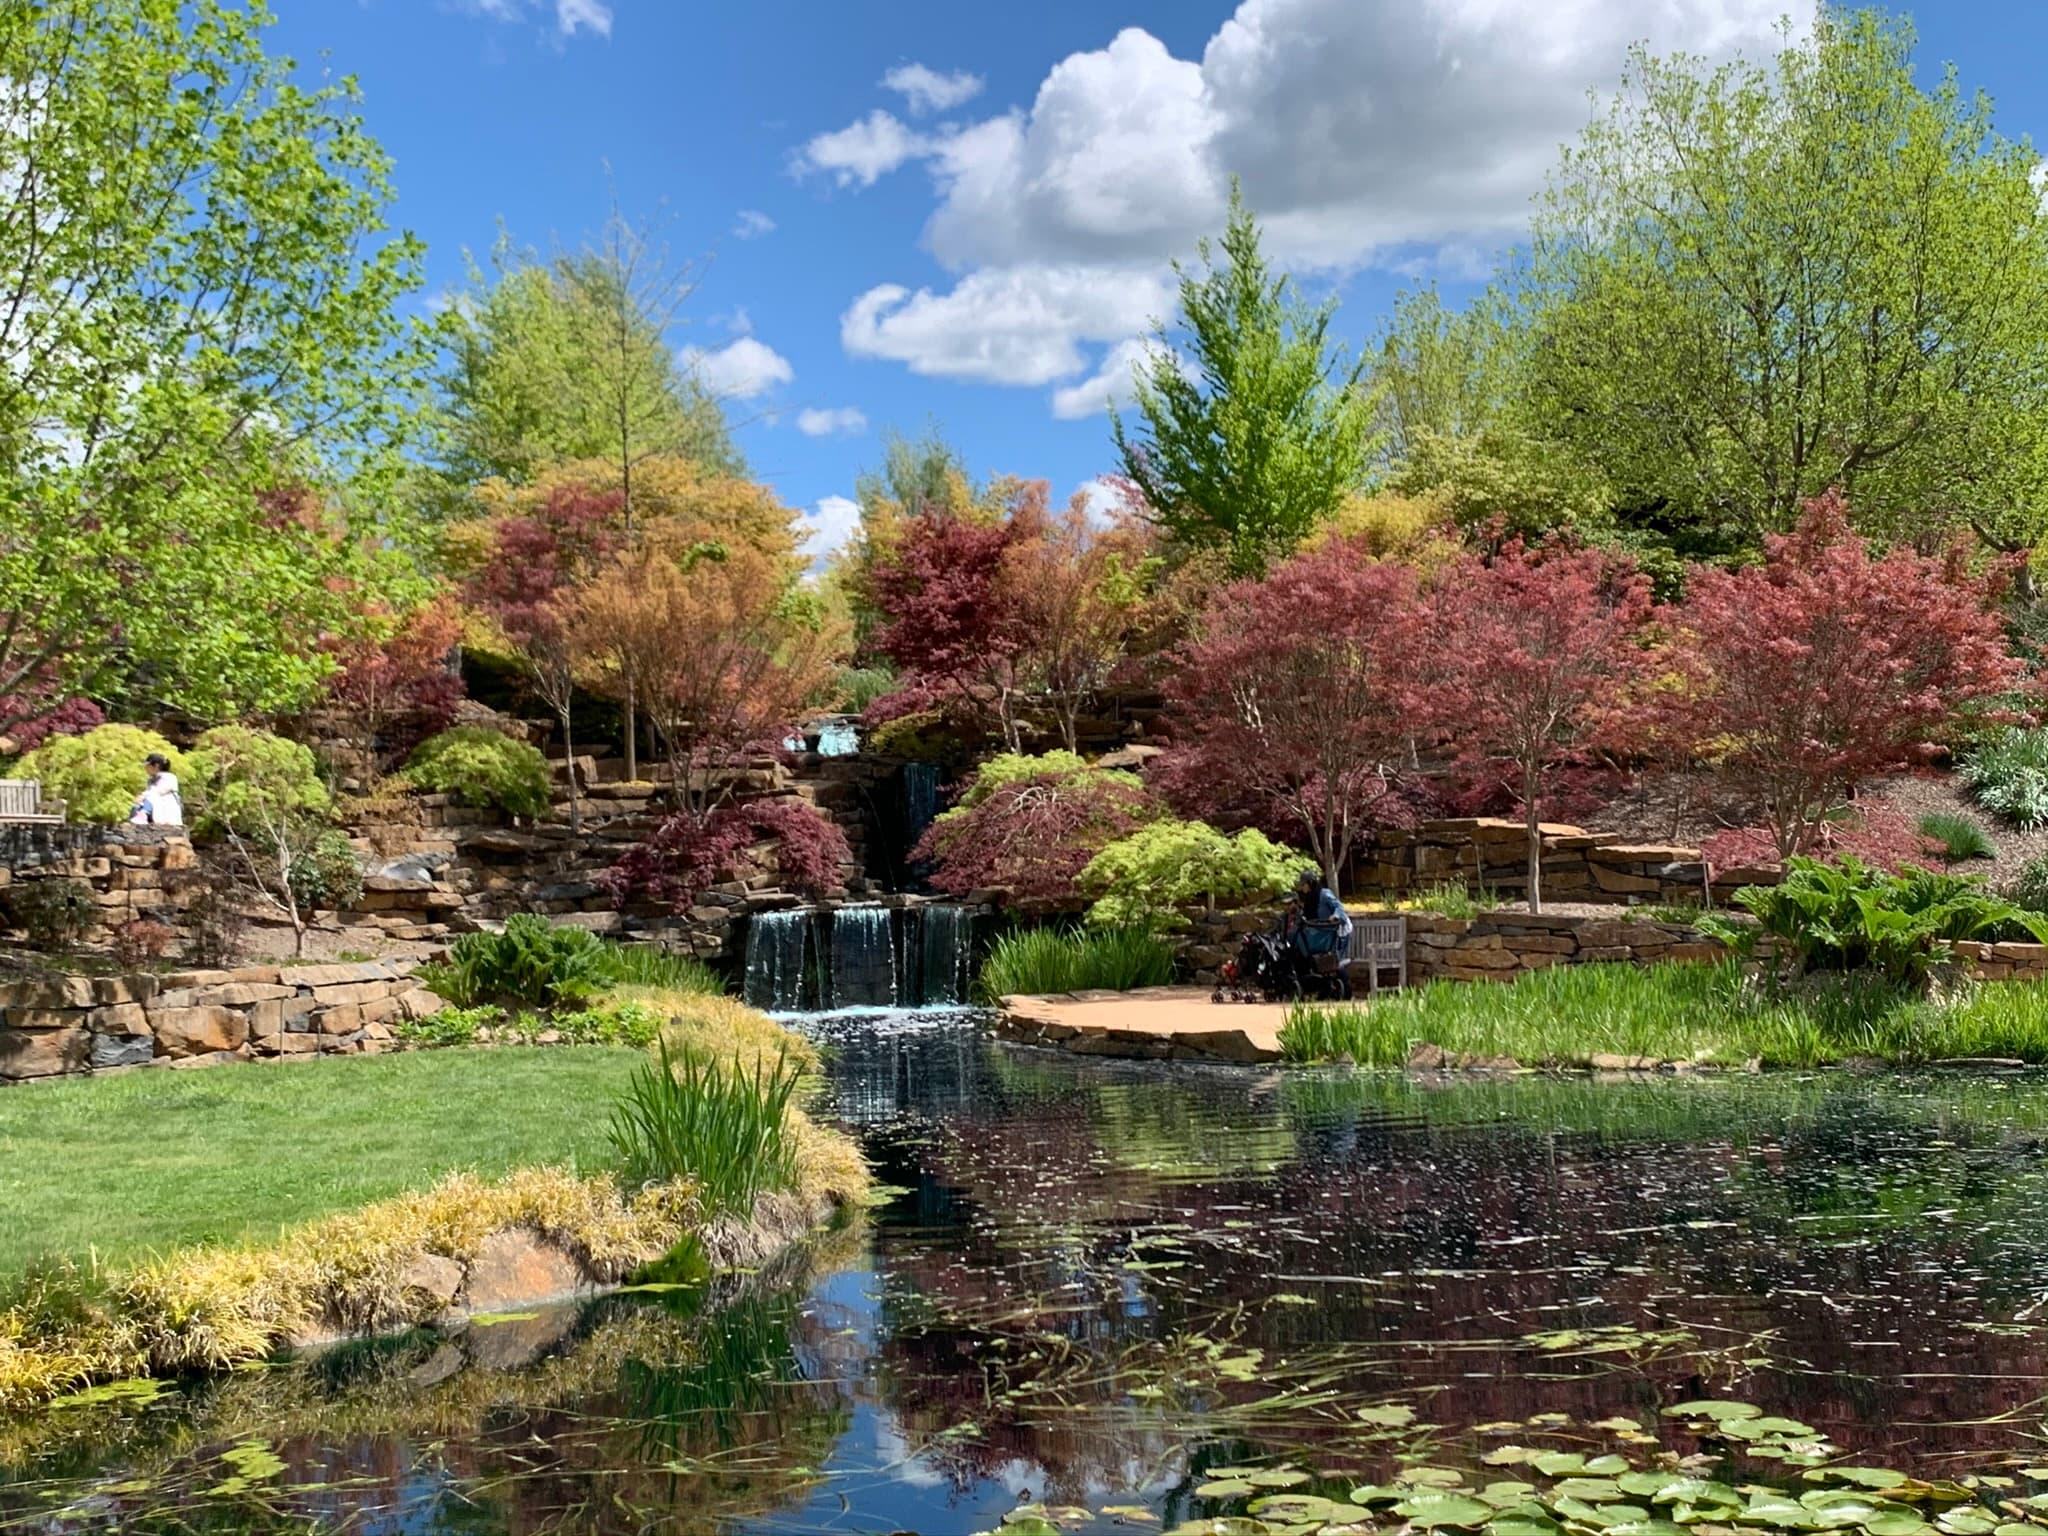 Autumn garden and pond near Oberon